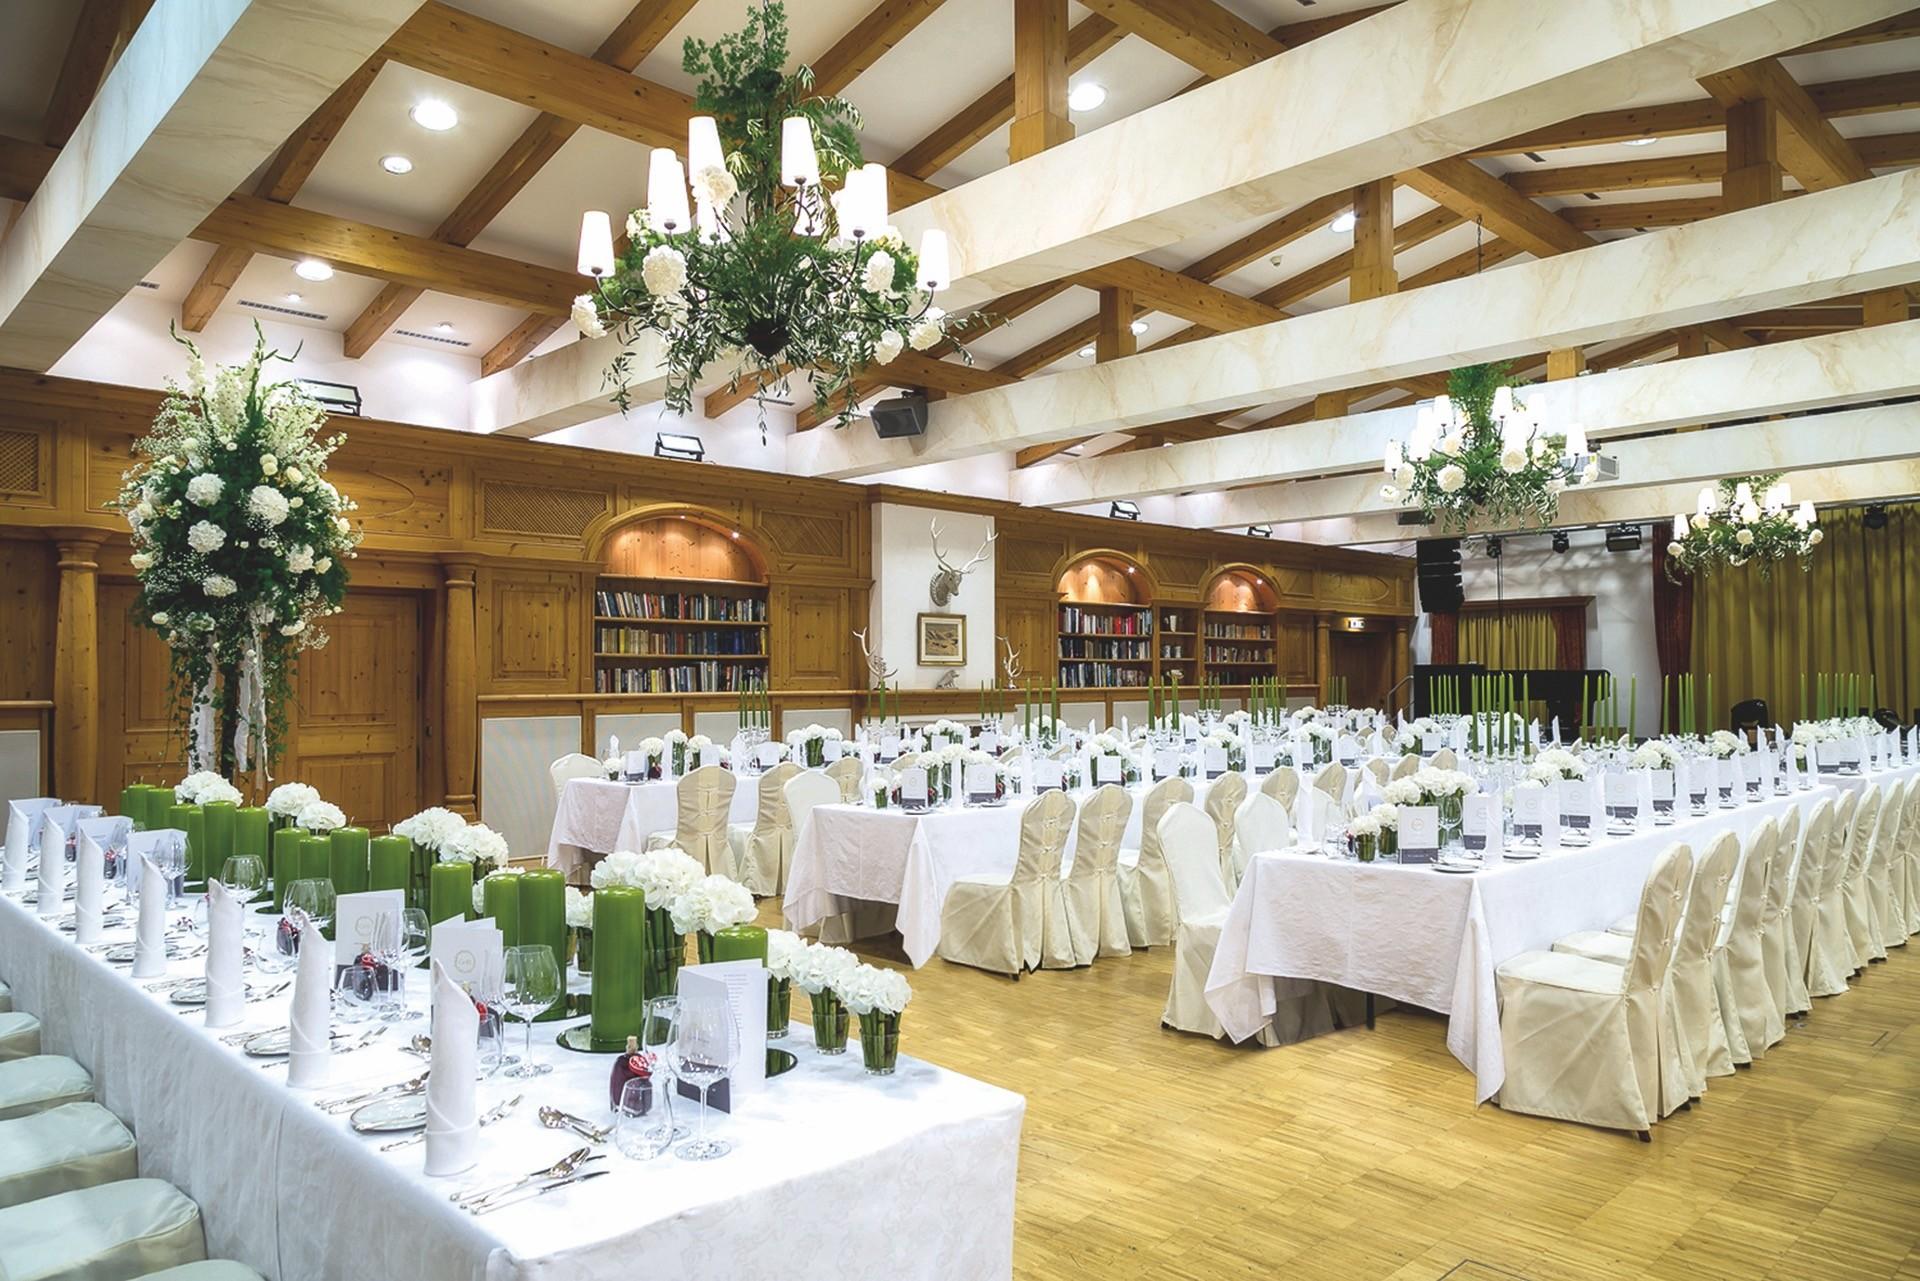 Heiraten in Kitzbühel